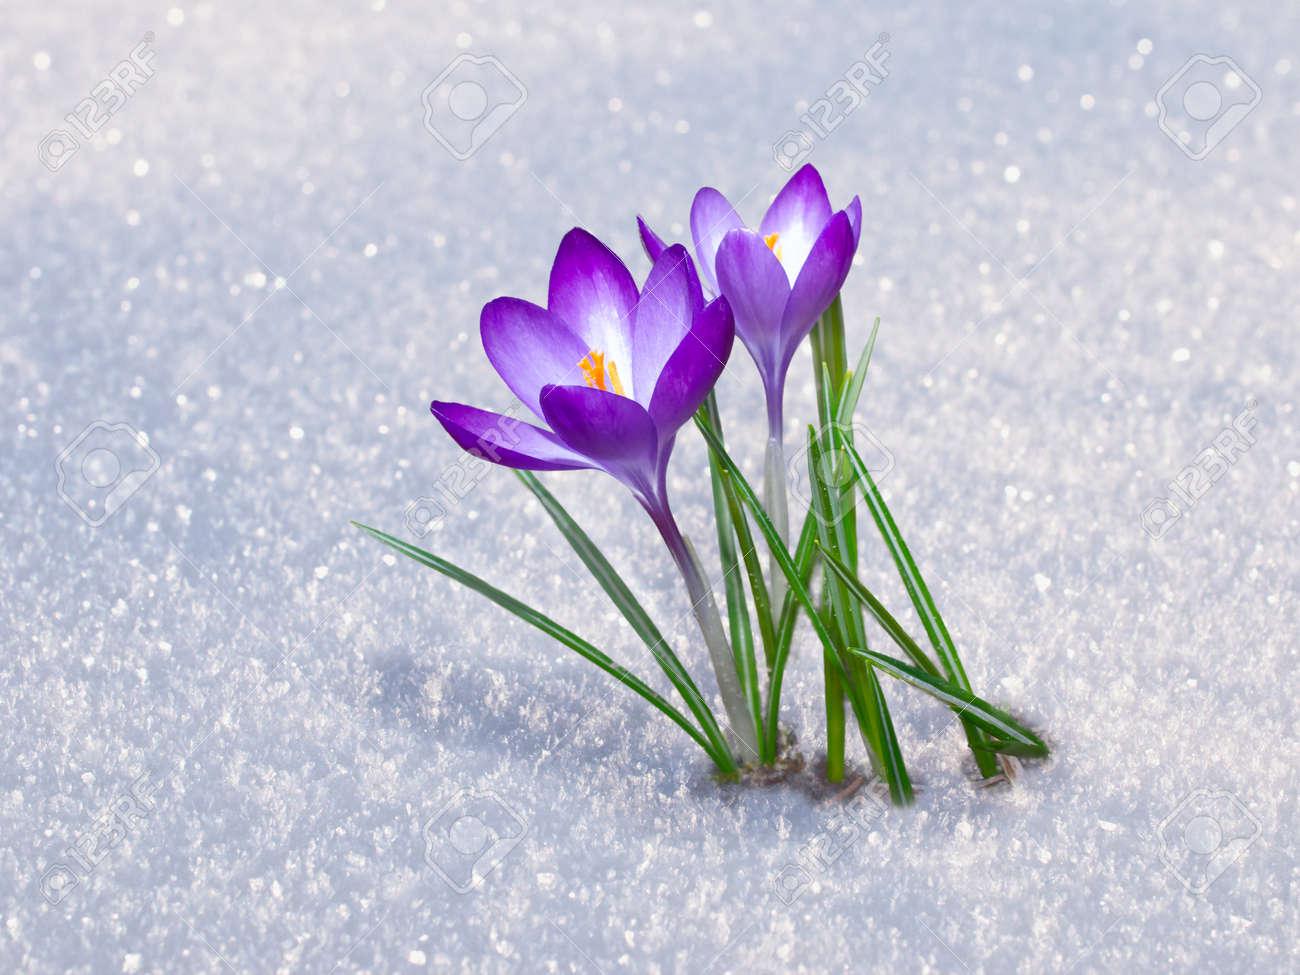 First Blue Crocus Flowers, Spring Saffron In Fluffy Snow Stock ...